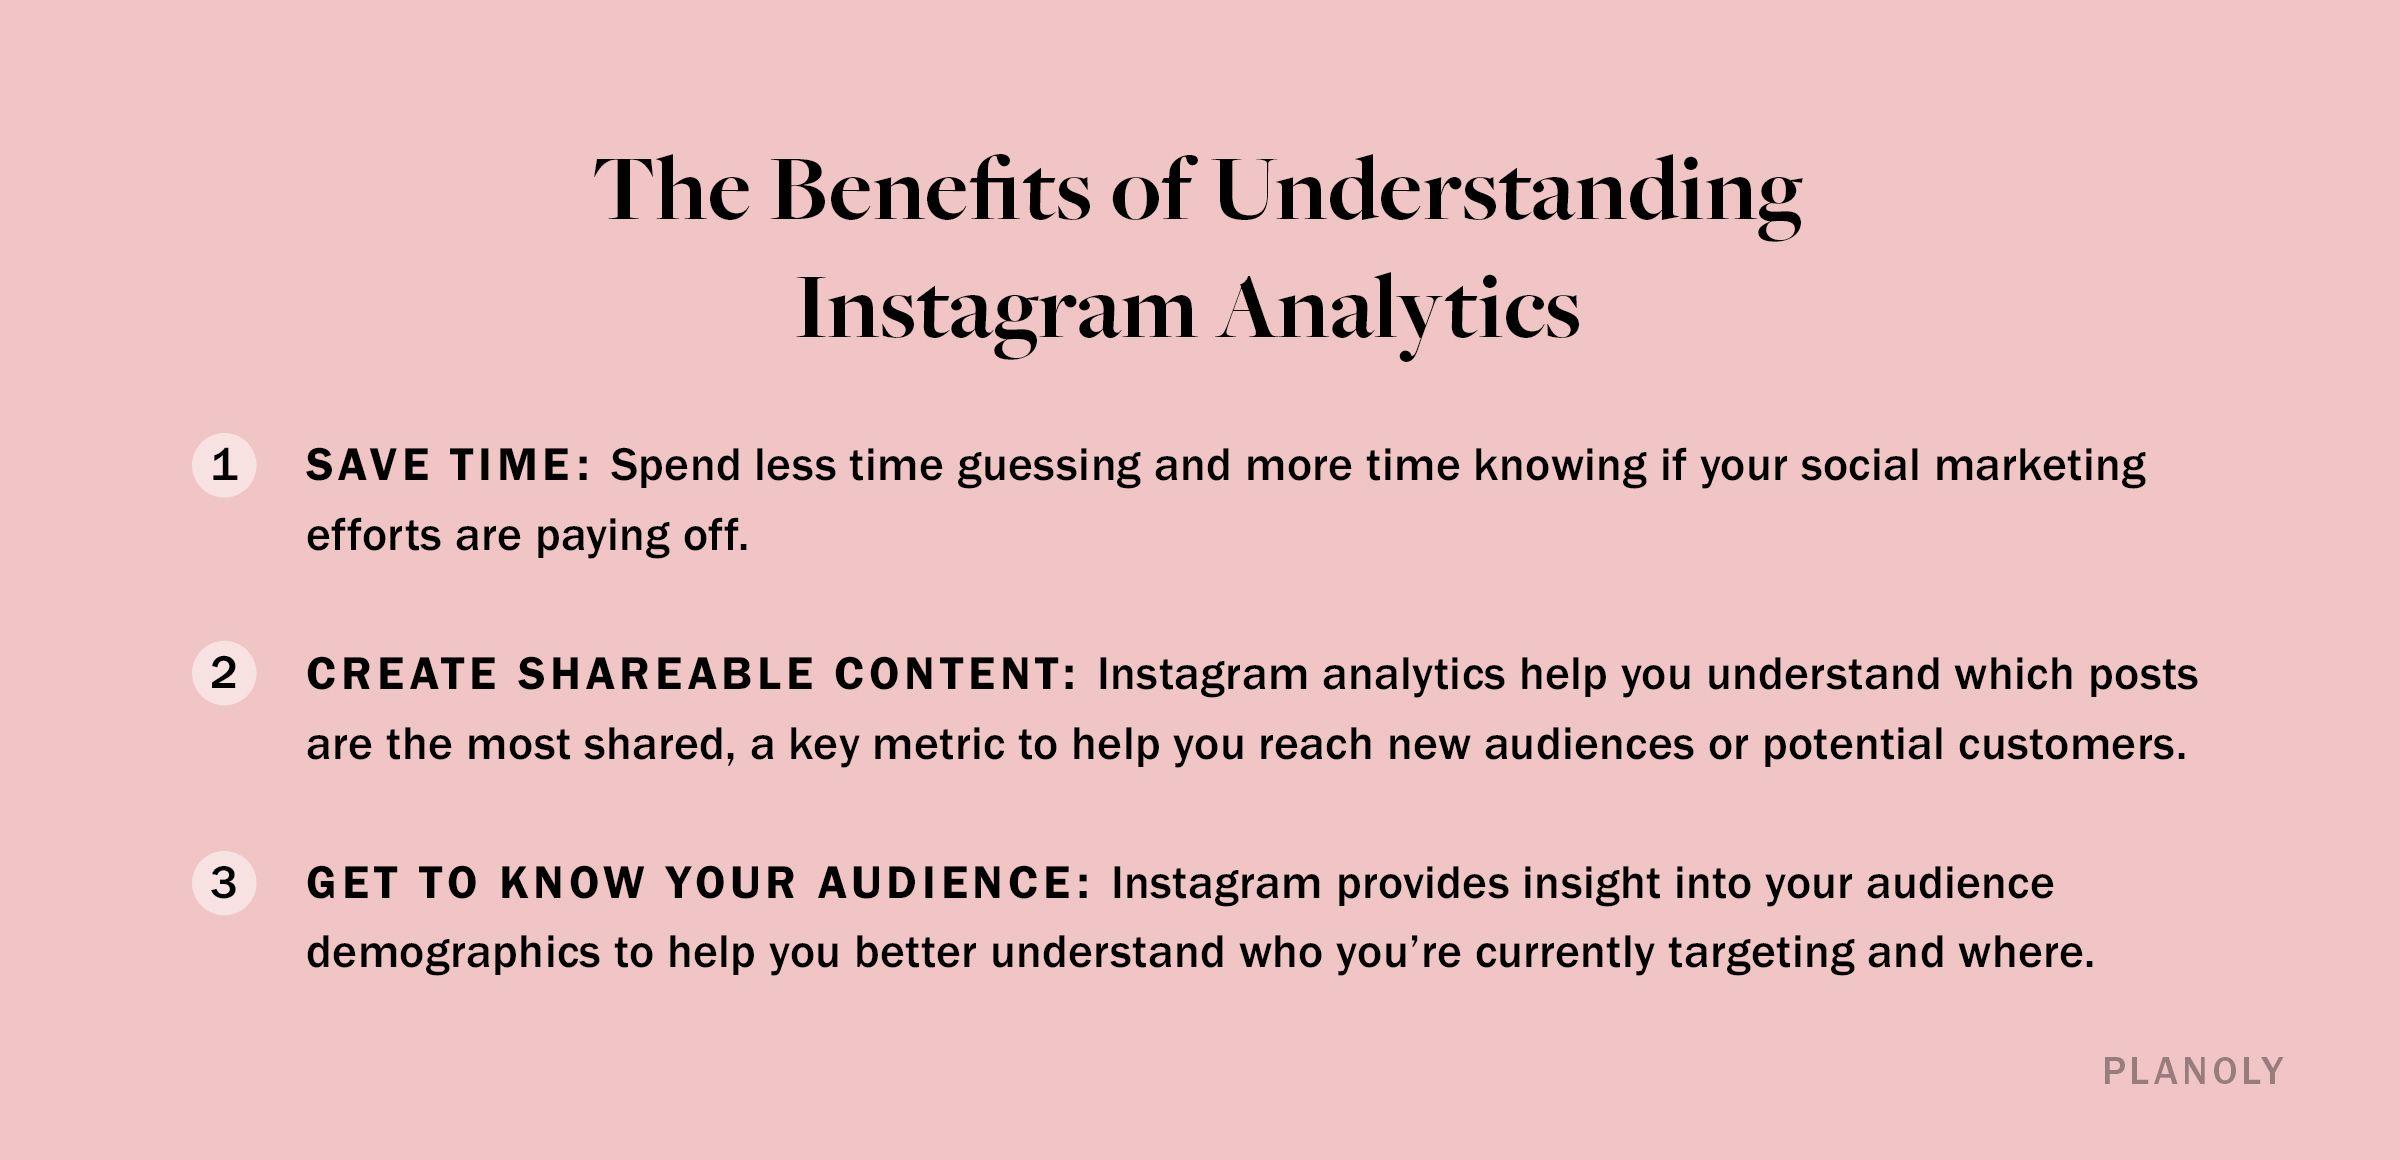 PLANOLY - Blog Post - Instagram Insights Tutorial - Image 2